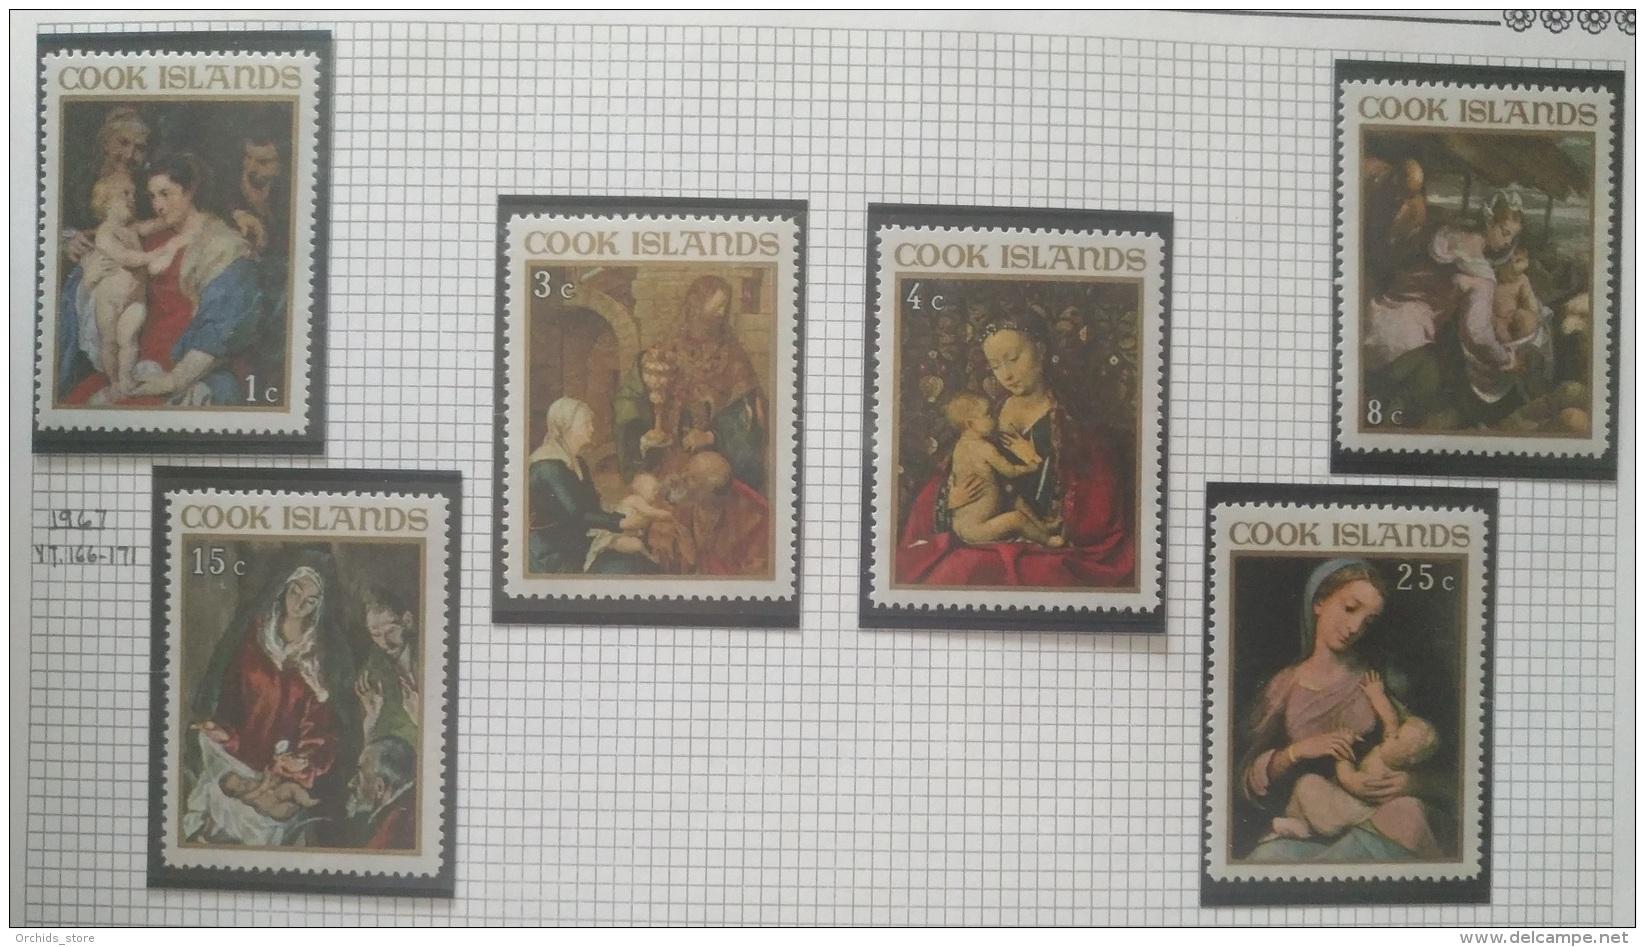 P7 Paintings - Cook Islands 1967 Yv. 166-171 Cplete Set 6v MNH Christmas Rubens Durer Van Eyck Bassano El Greco Antopnio - Cook Islands